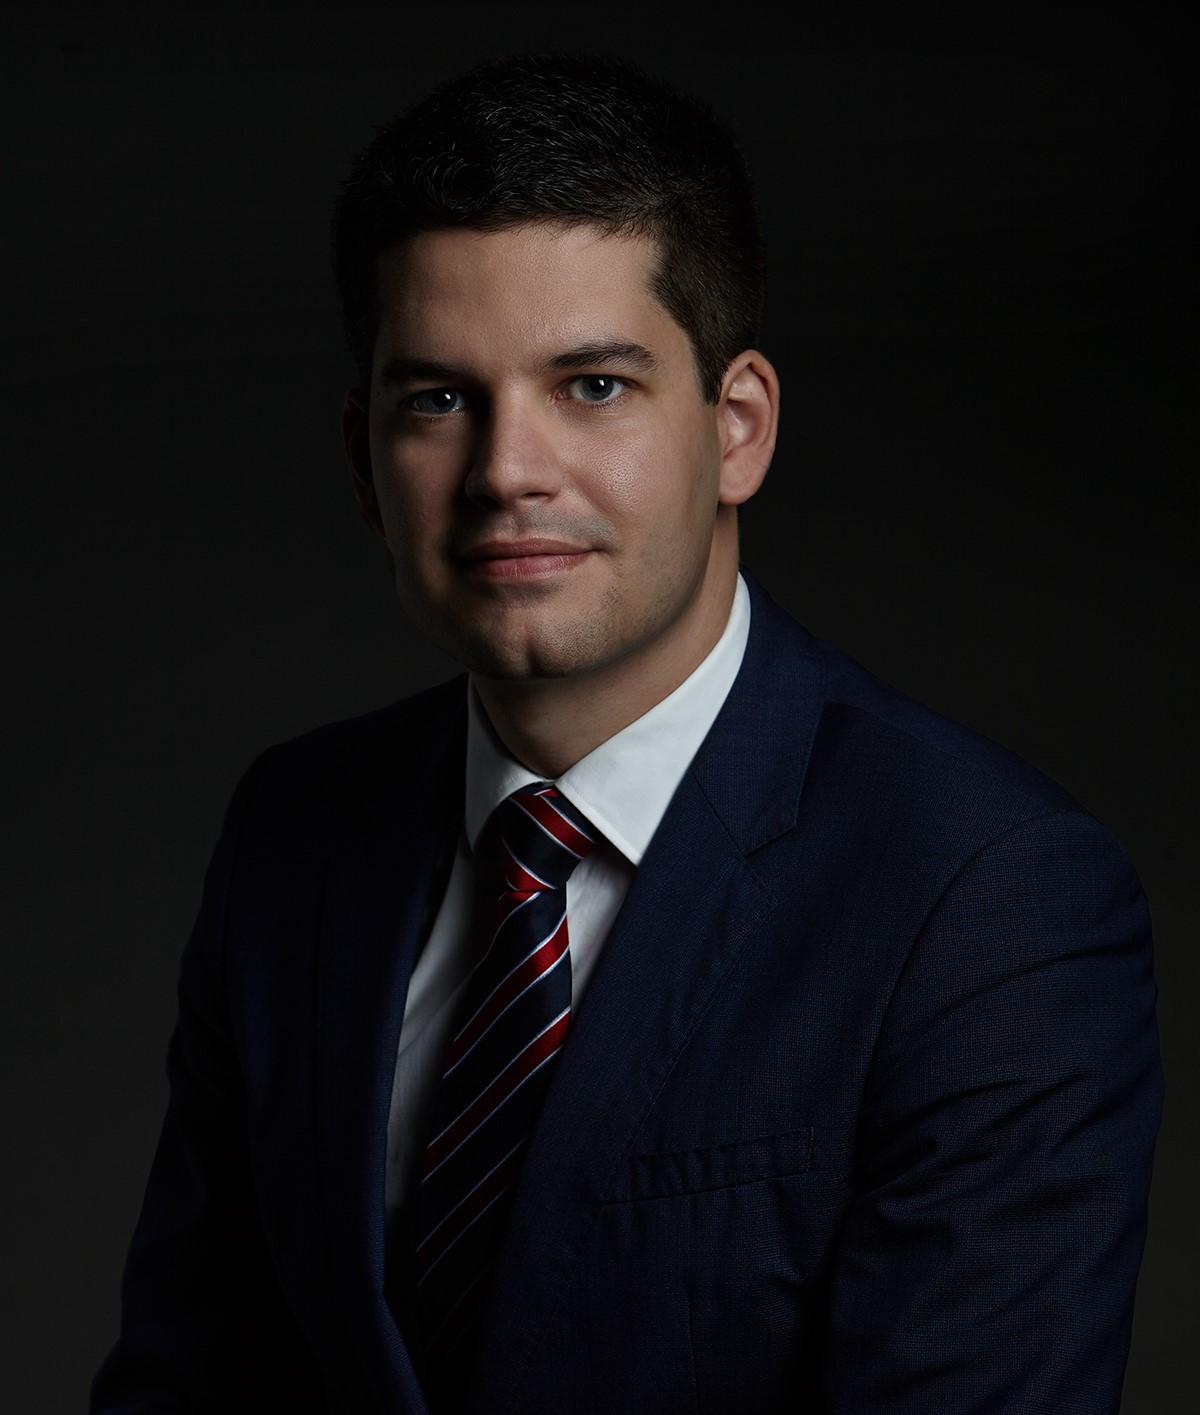 Dr. Stubenvoll Zsolt